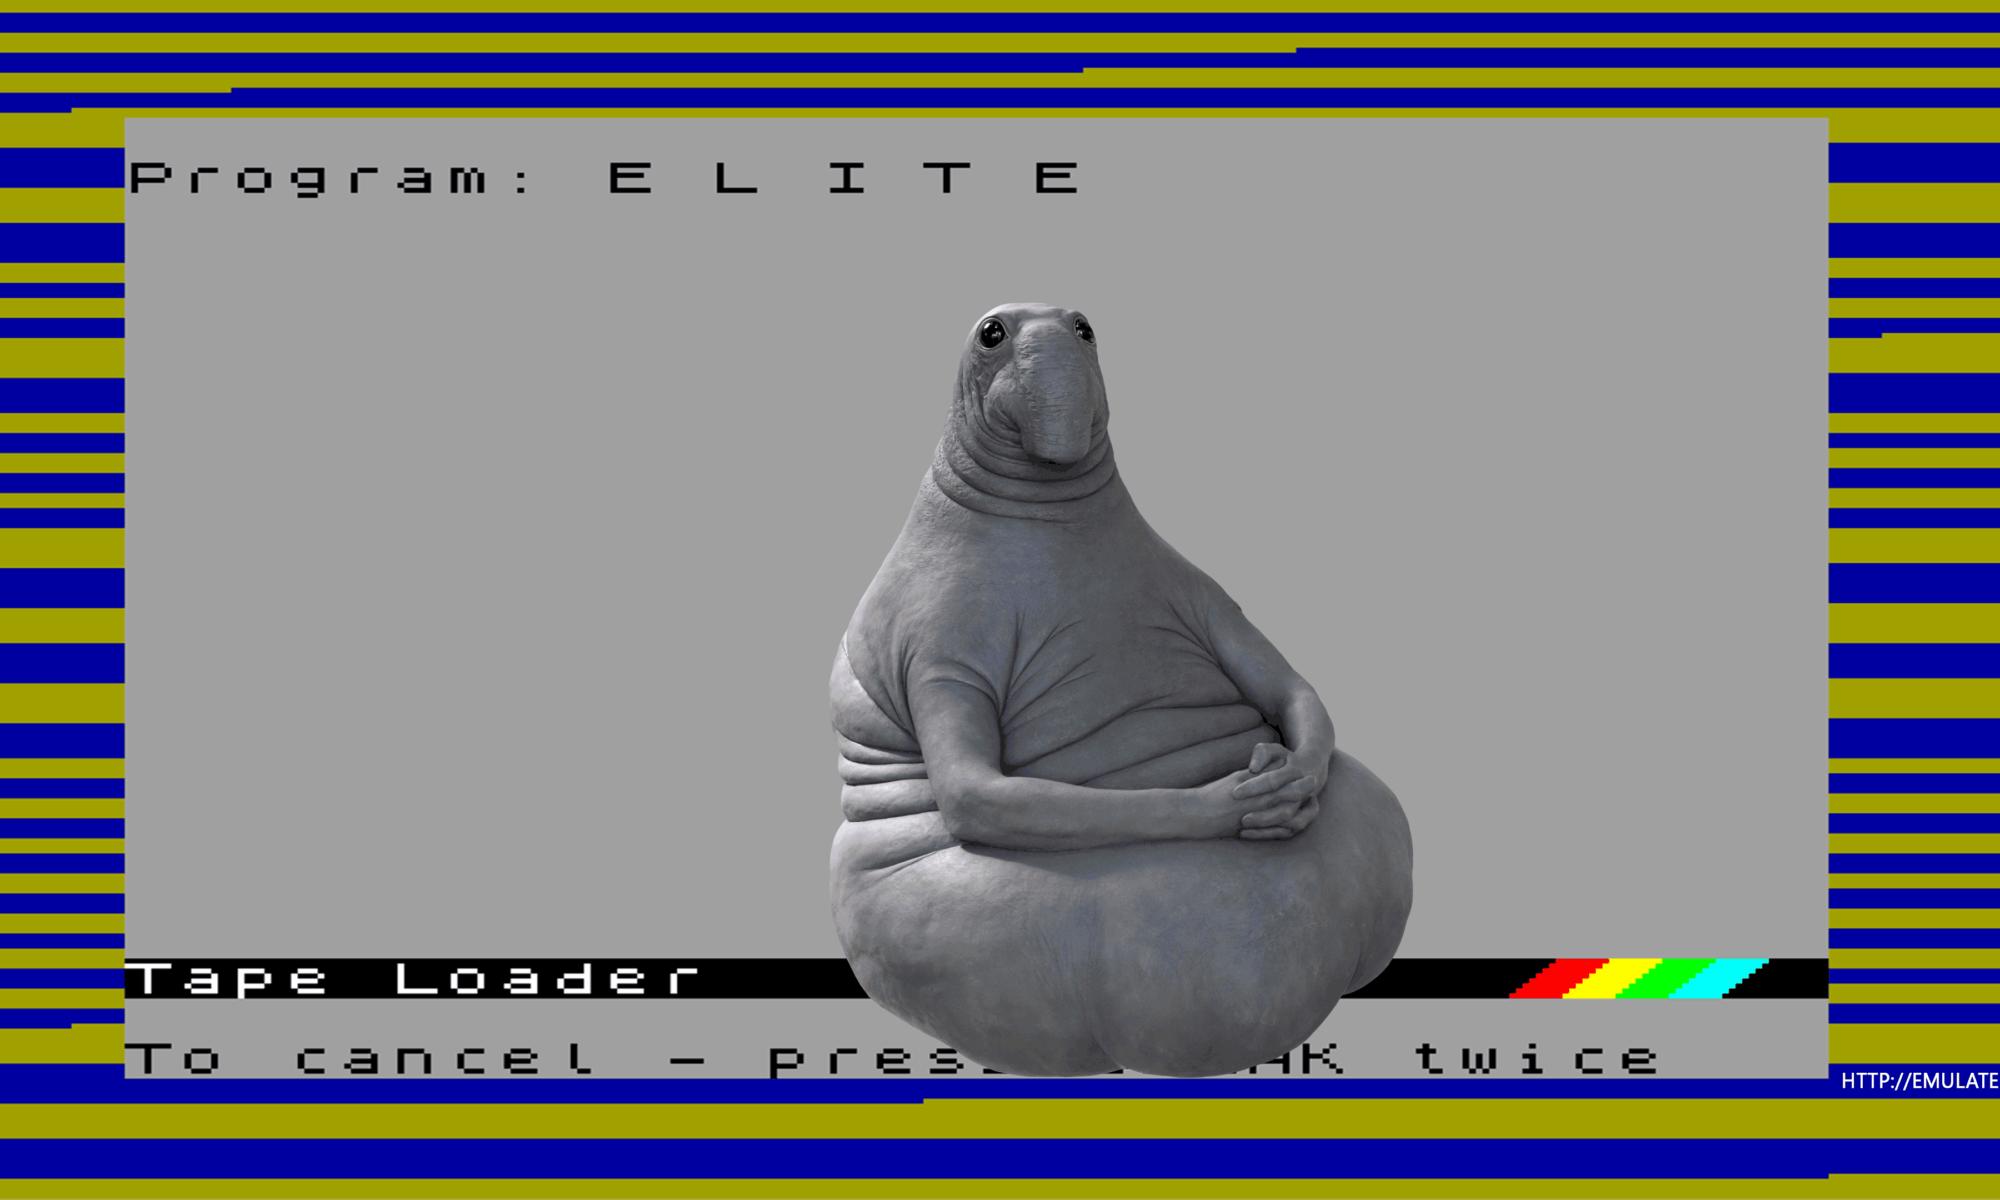 EMULATE.SU